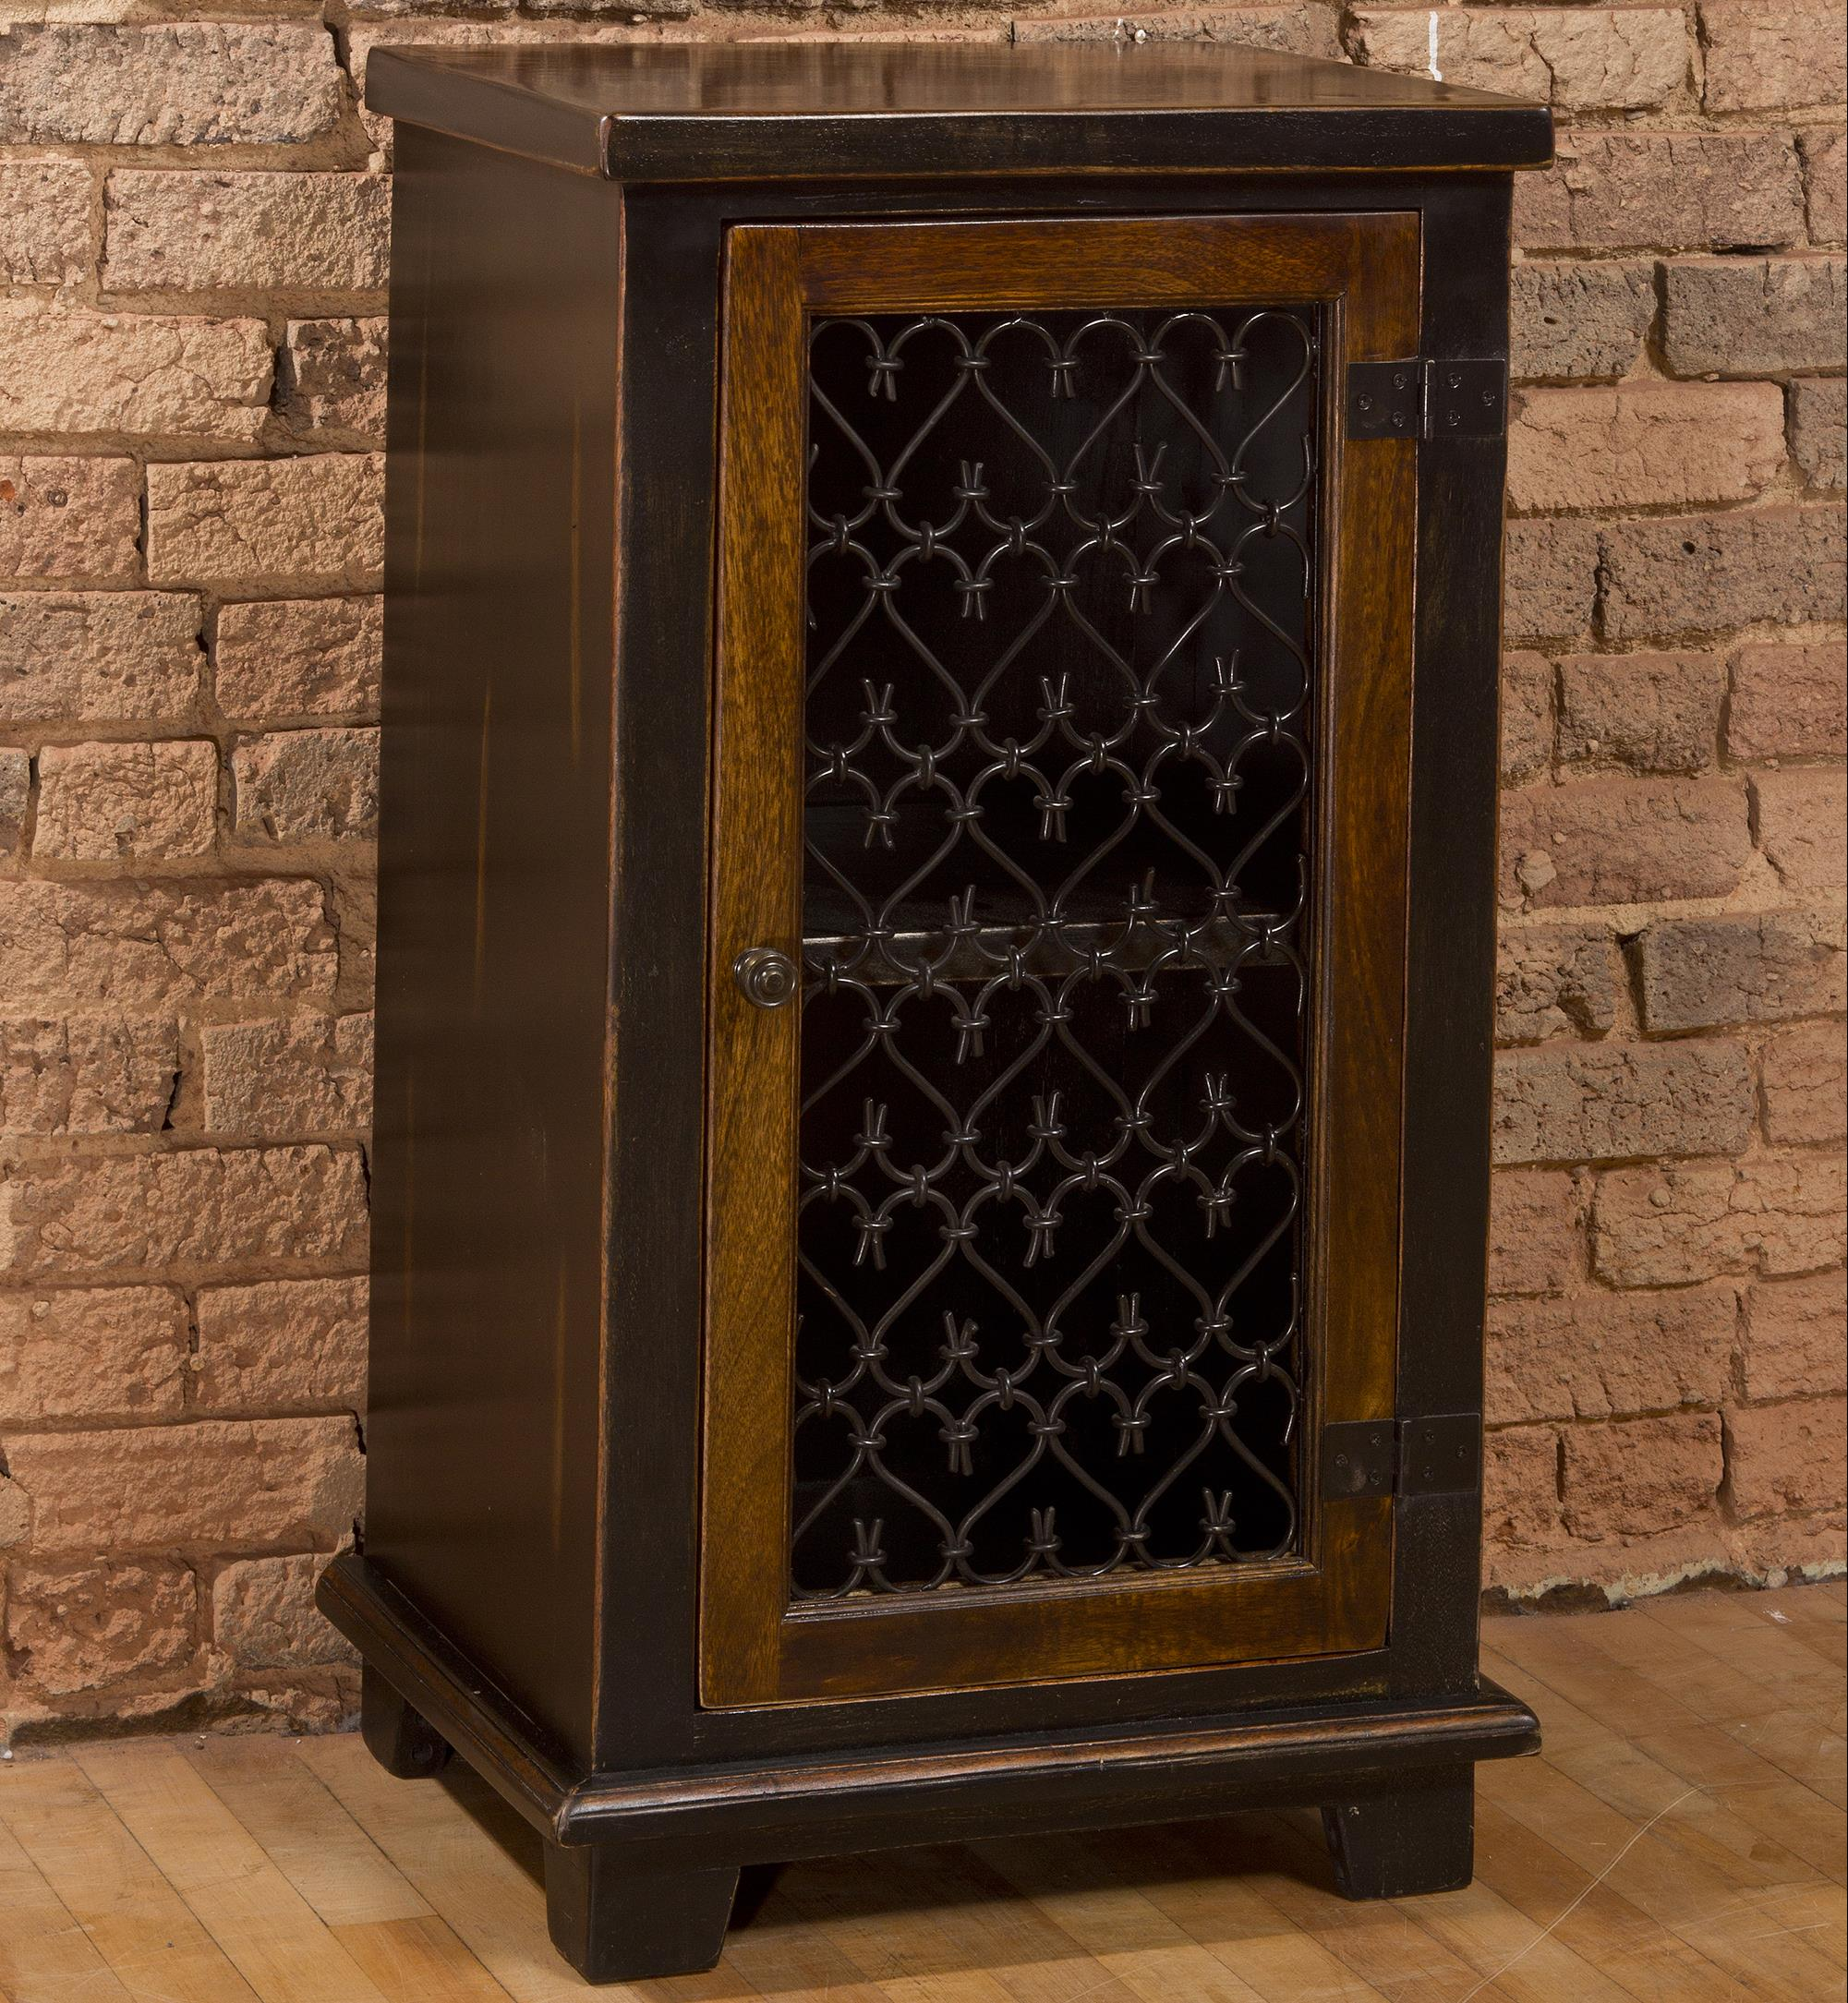 Hillsdale Accents Cabinet with Metal Insert Door - Item Number: 5731-893